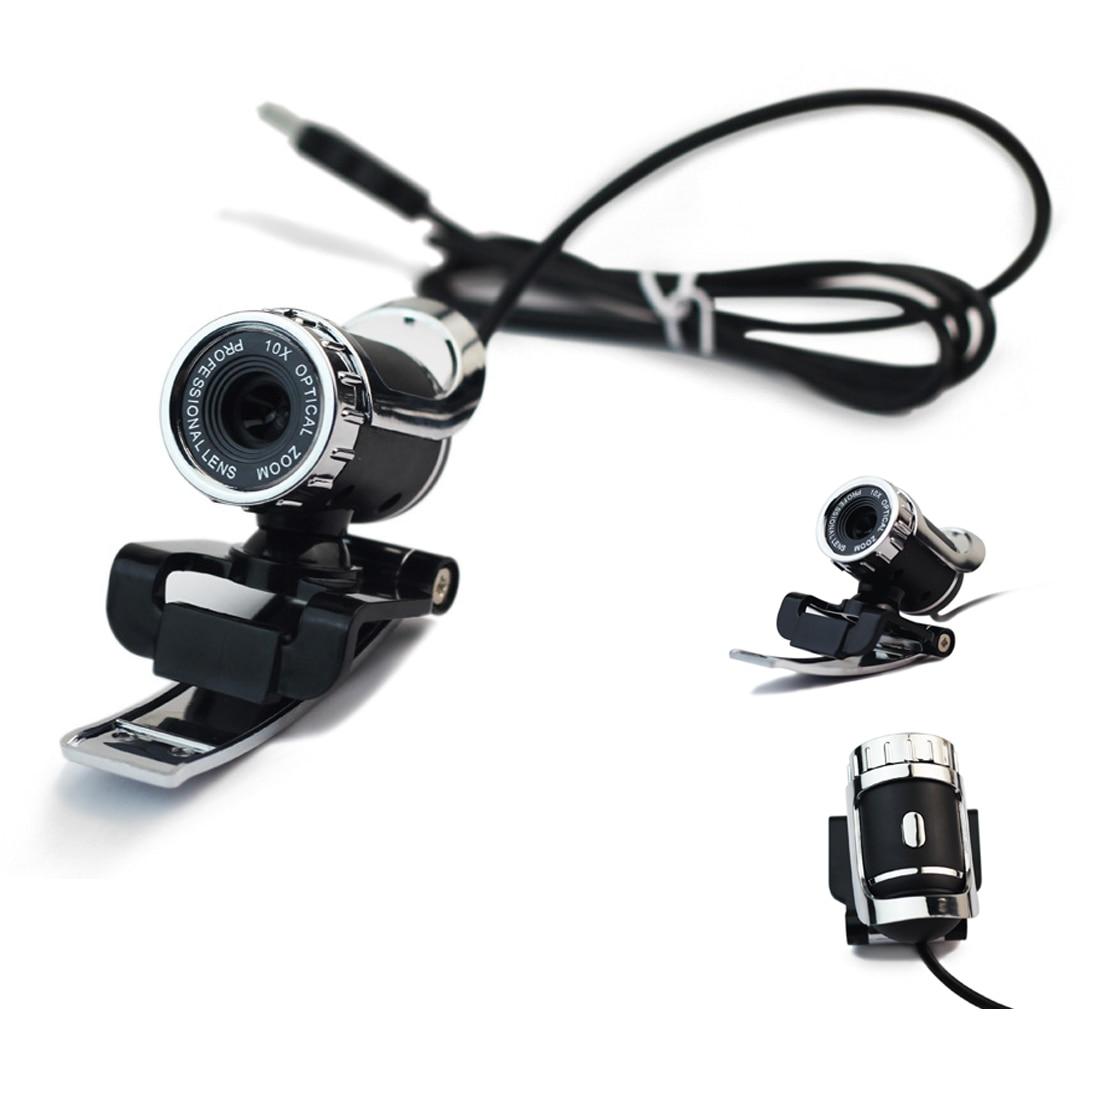 NOYOKERE Newest Webcam USB 12 Megapixel High Definition Camera Web Cam 360 Degree MIC Cl ...